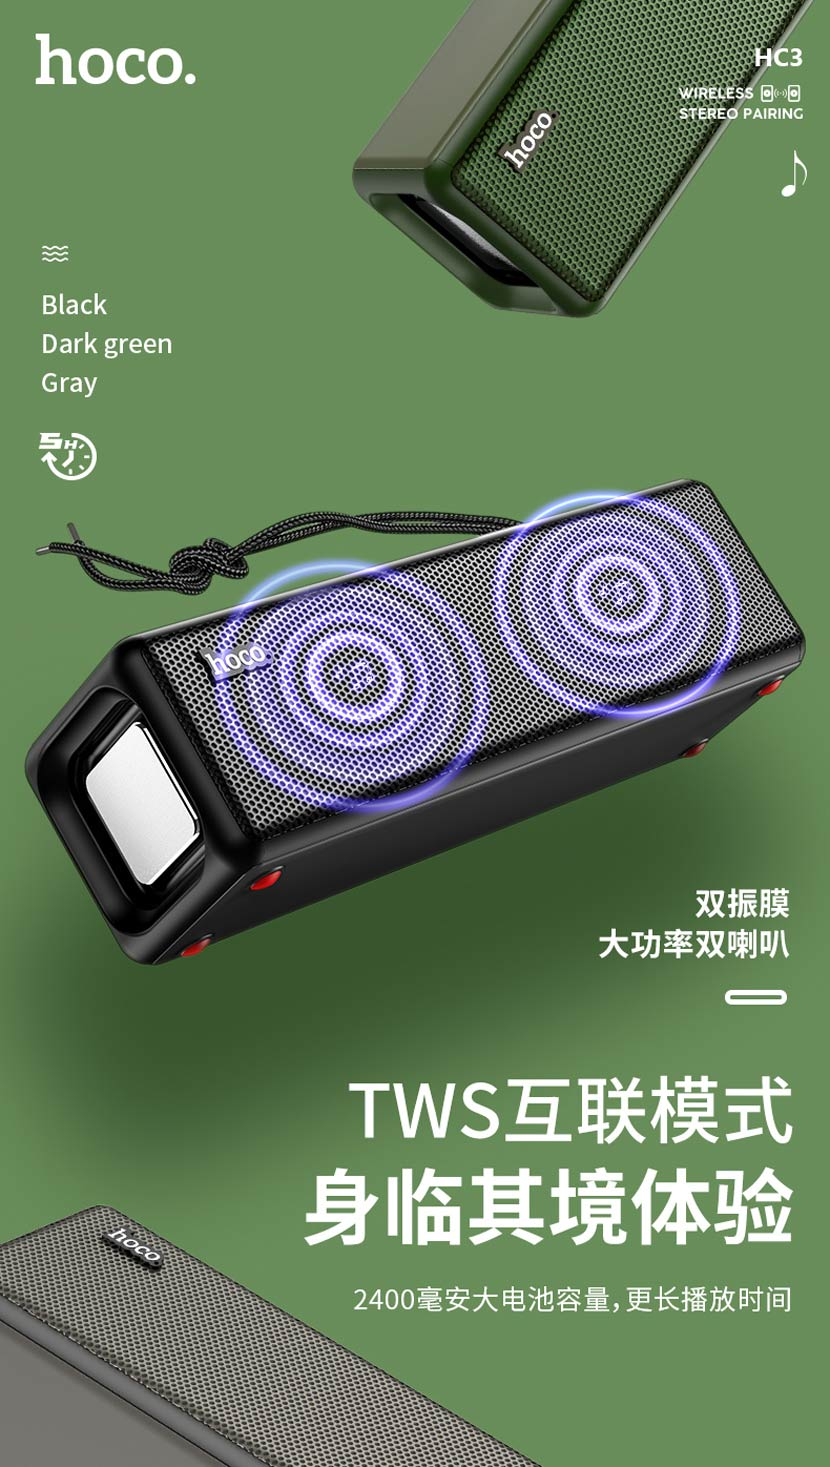 hoco news hc3 bounce sports wireless speaker tws cn